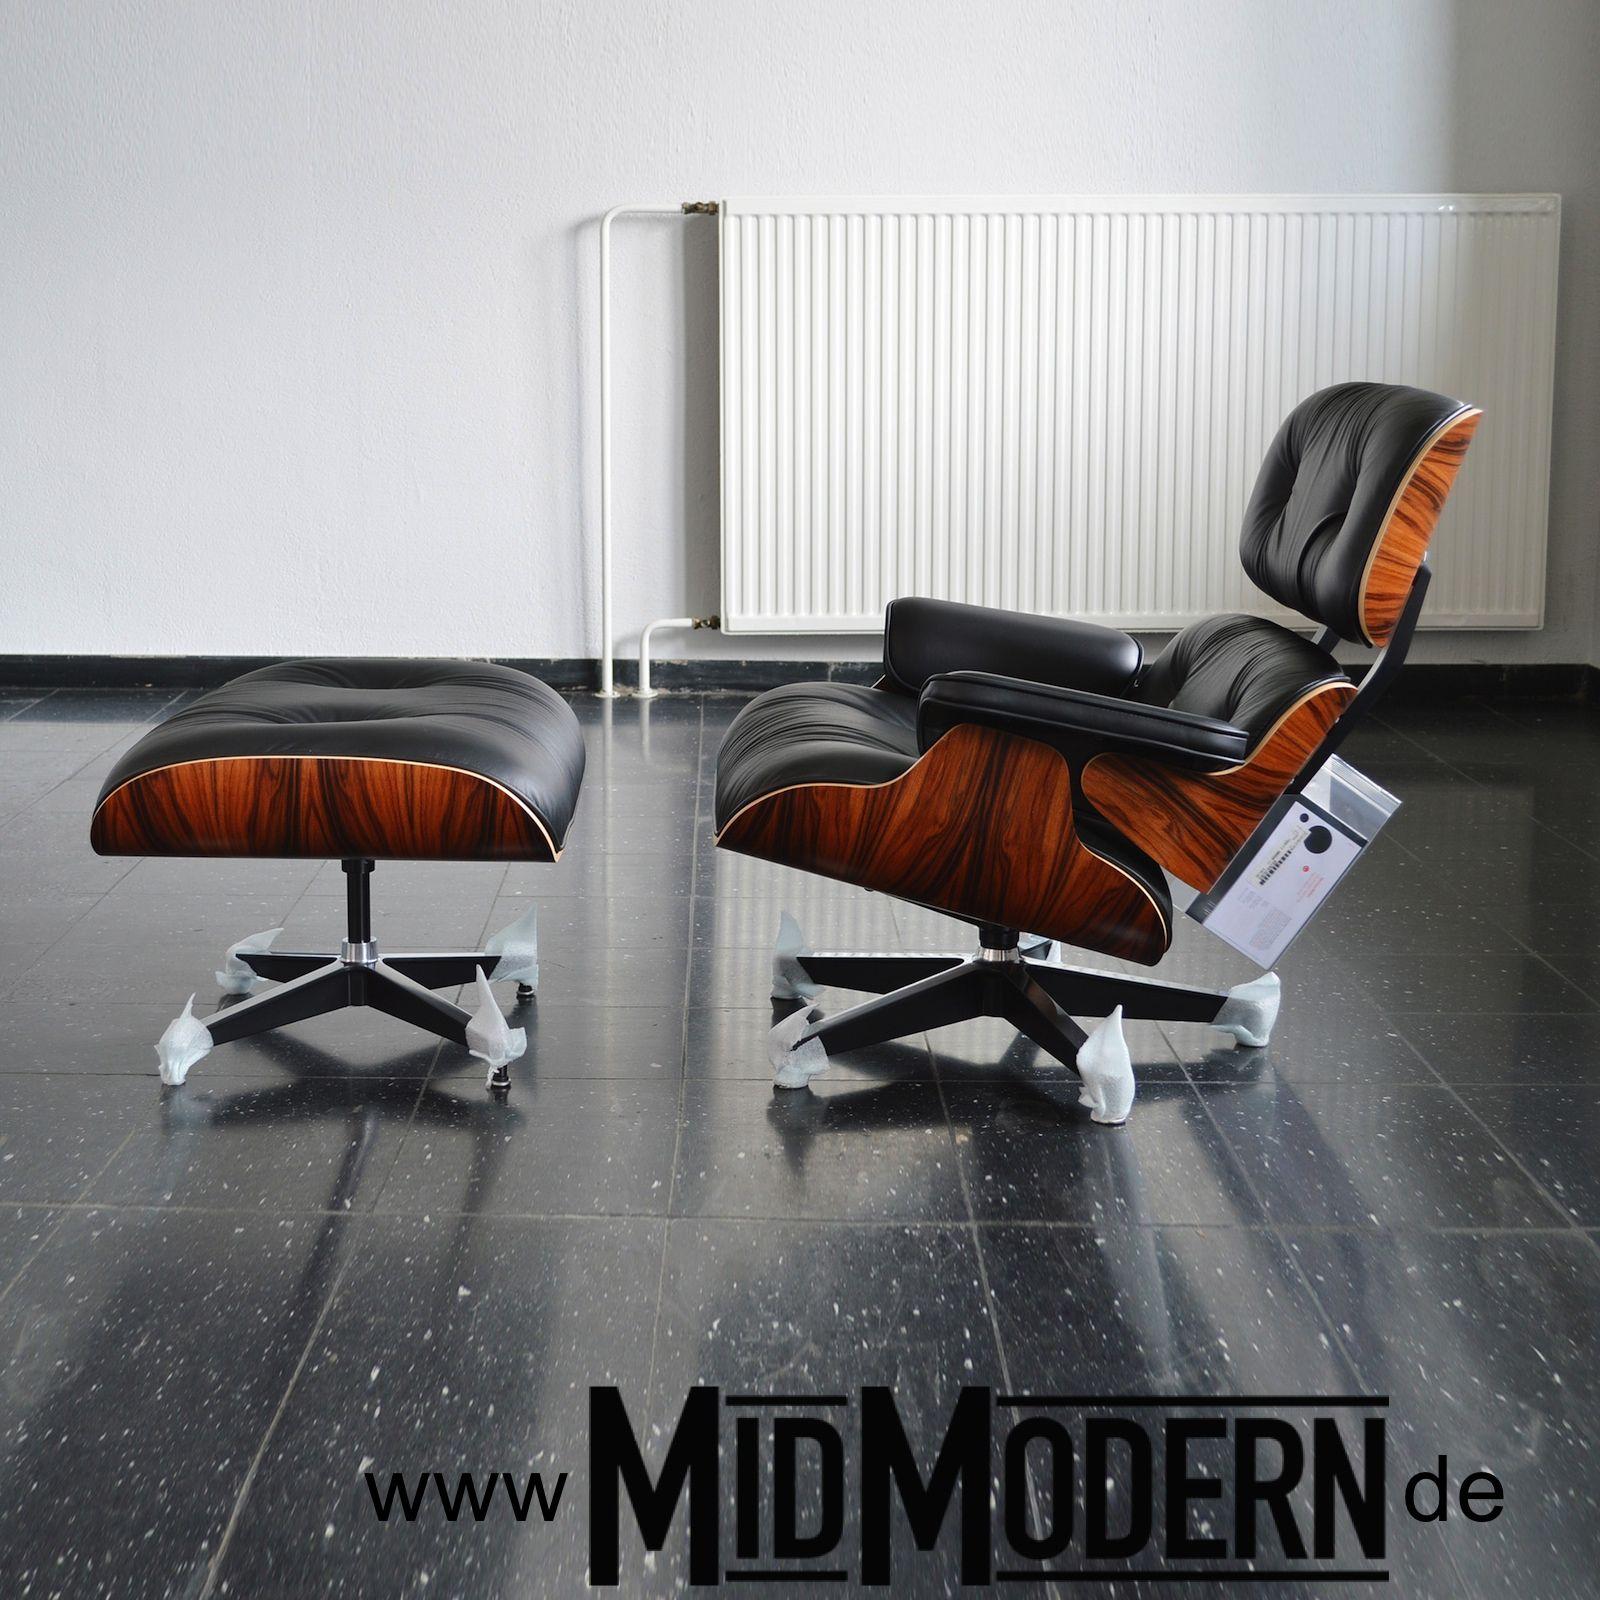 Eames Lounge Chair Ottoman Herman Miller 2013 Santos Palisander Black Anilin Leather Möbeldesign Modernes Möbeldesign Moderne Sessel